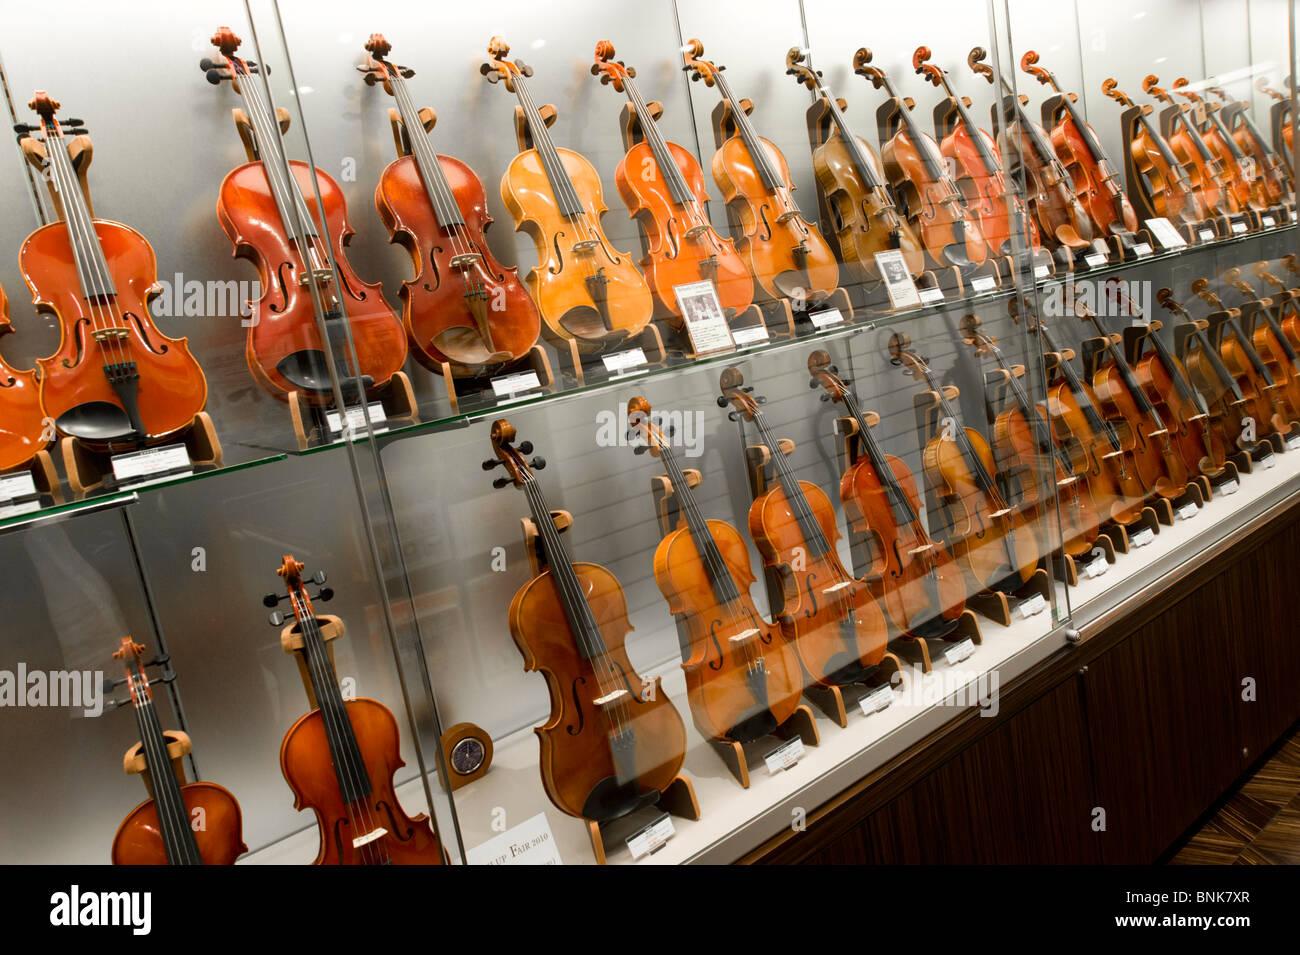 Violins in Yamaha Hall music shop in Chuo-dori, Ginza 4-chome, Tokyo